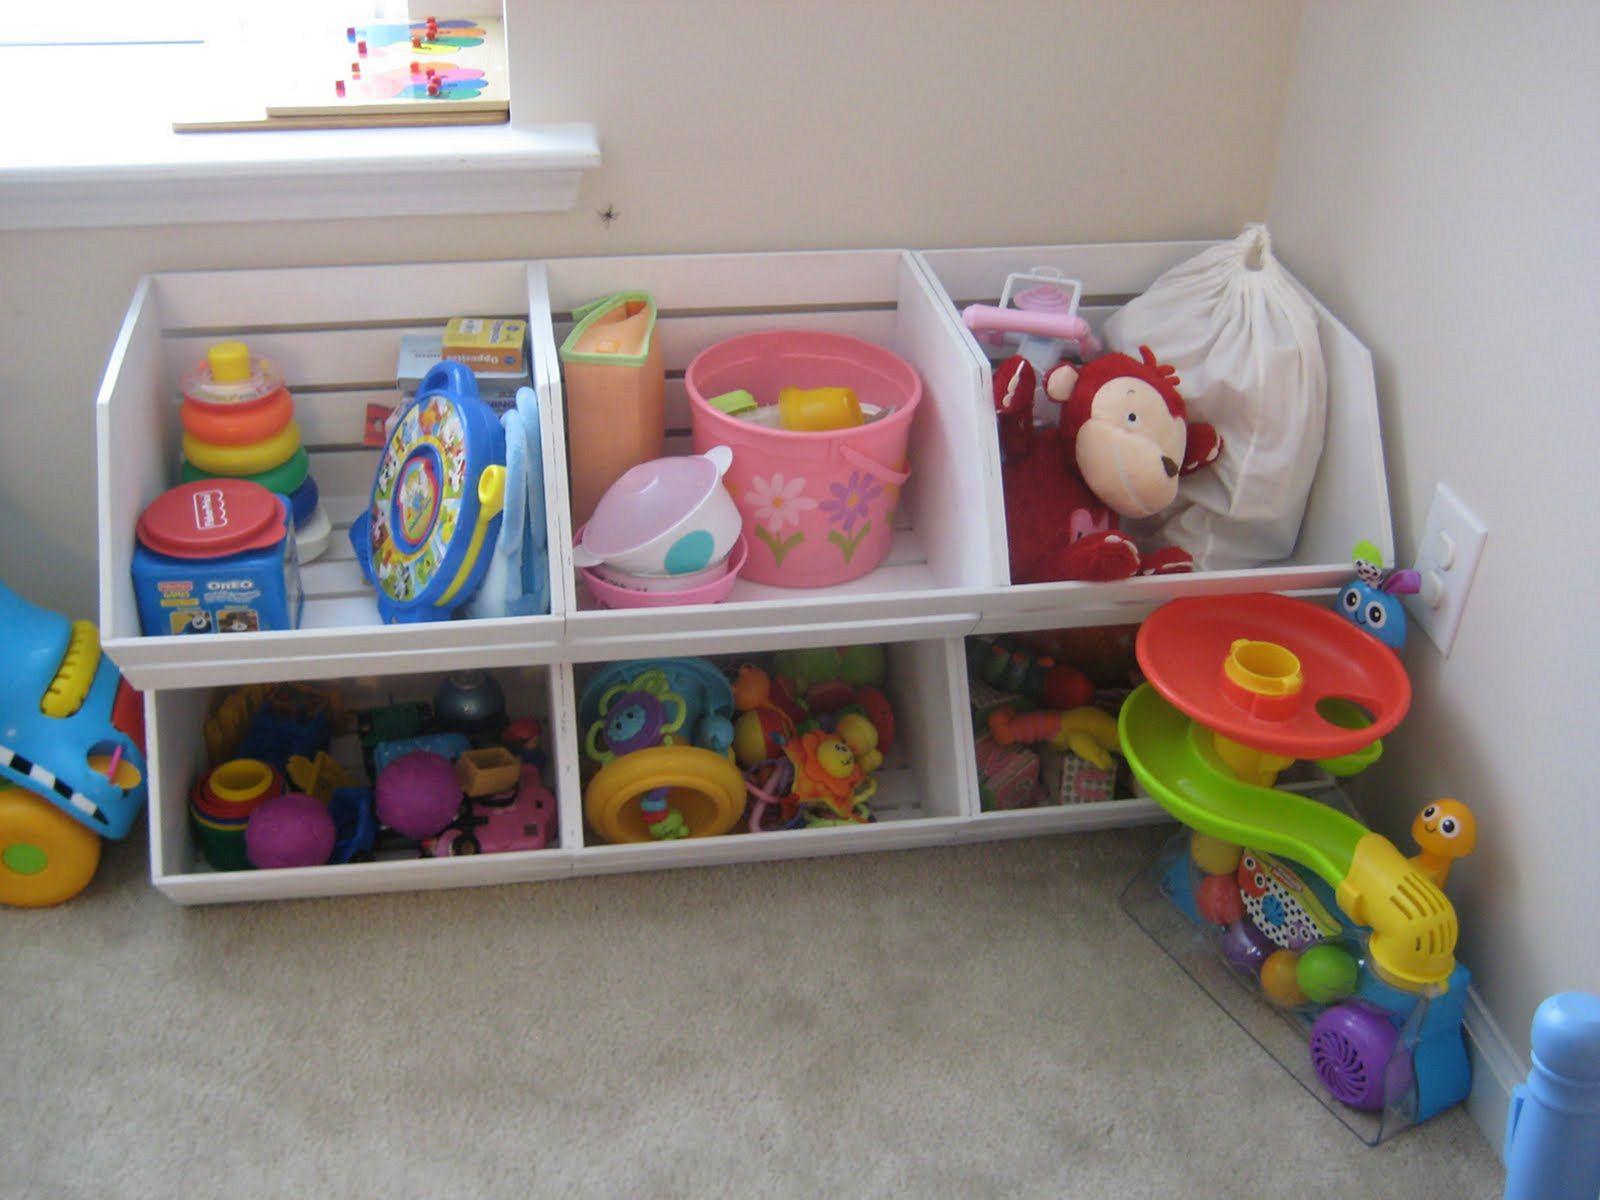 Toy Storage Organization Ideas 18